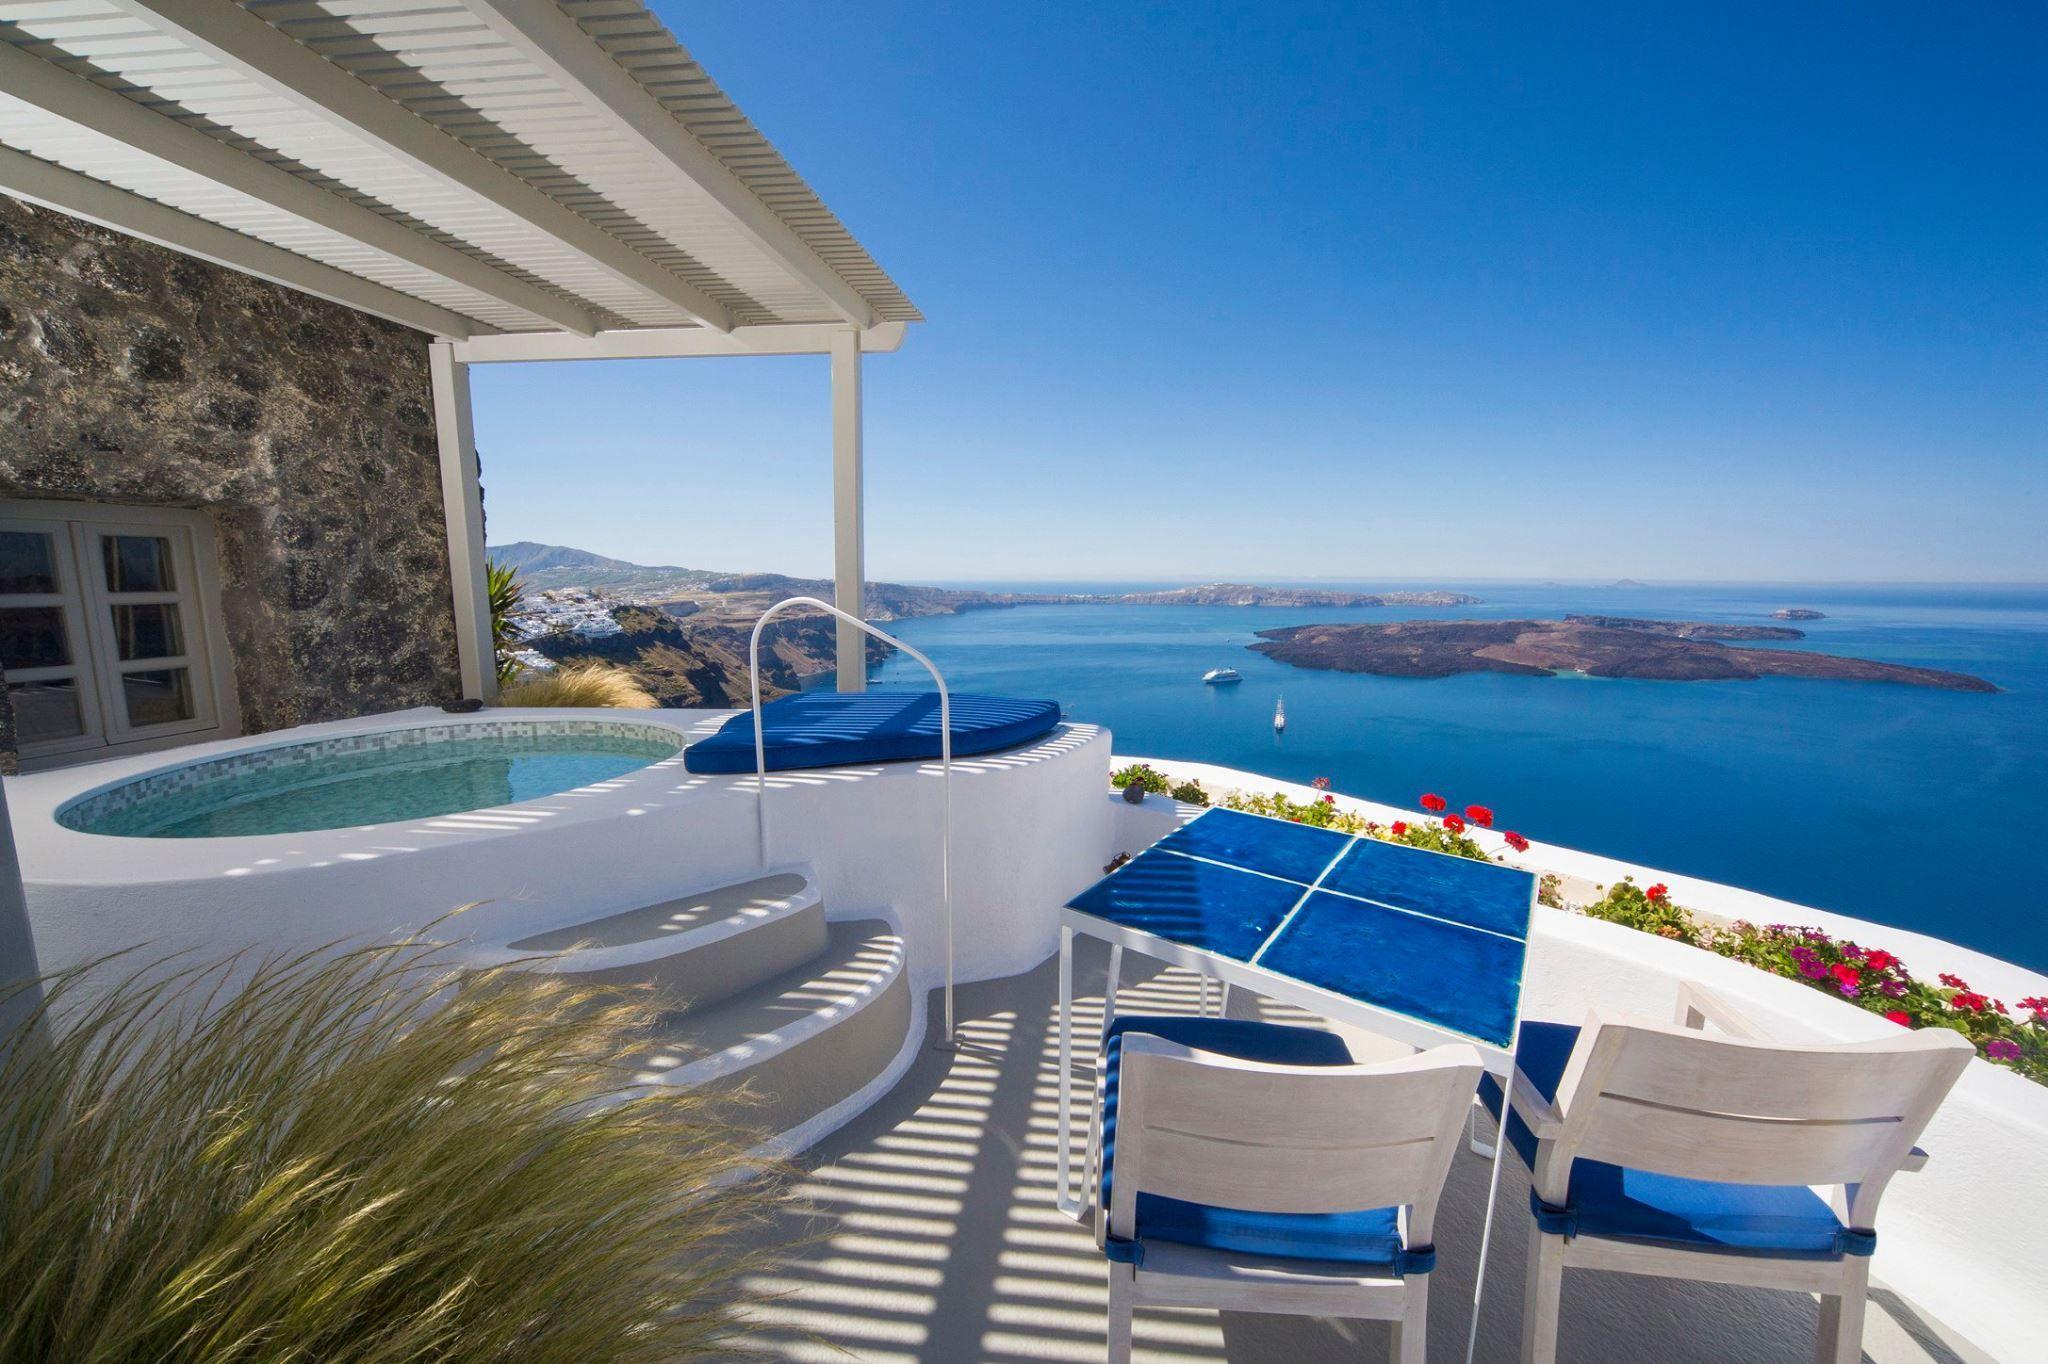 Iconic Santorini – Santorini, Greece